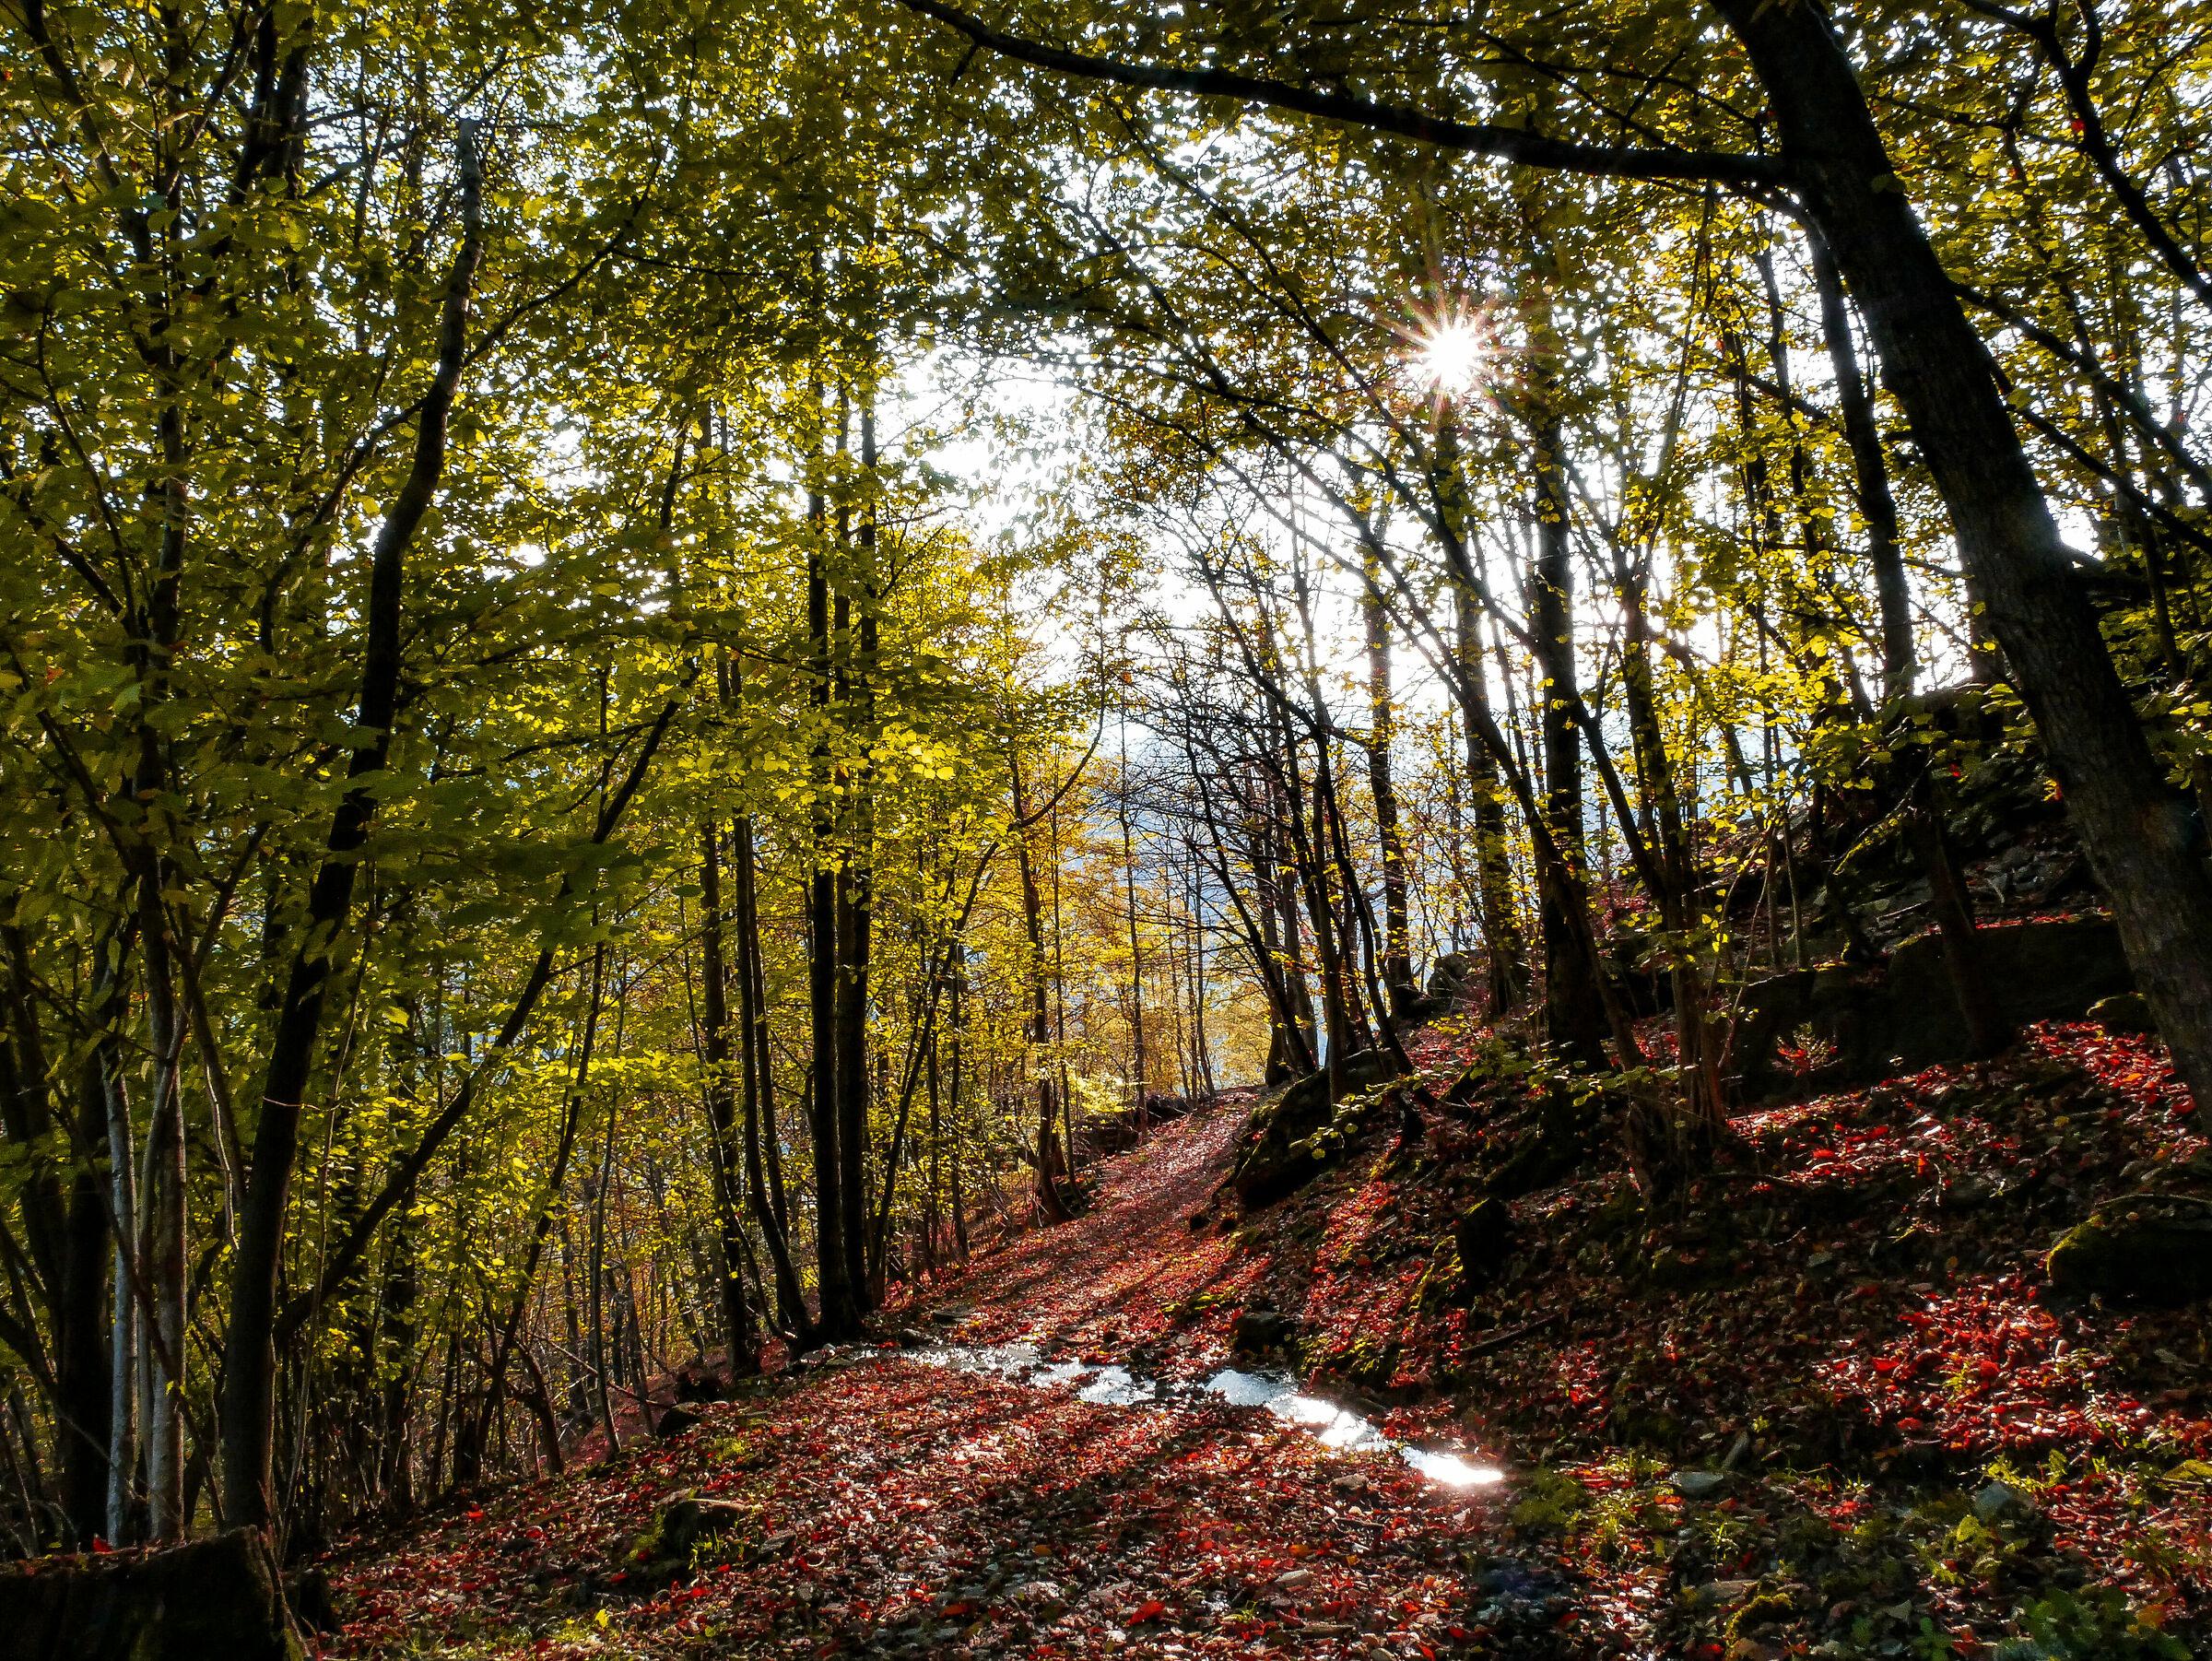 Down to the autumn...